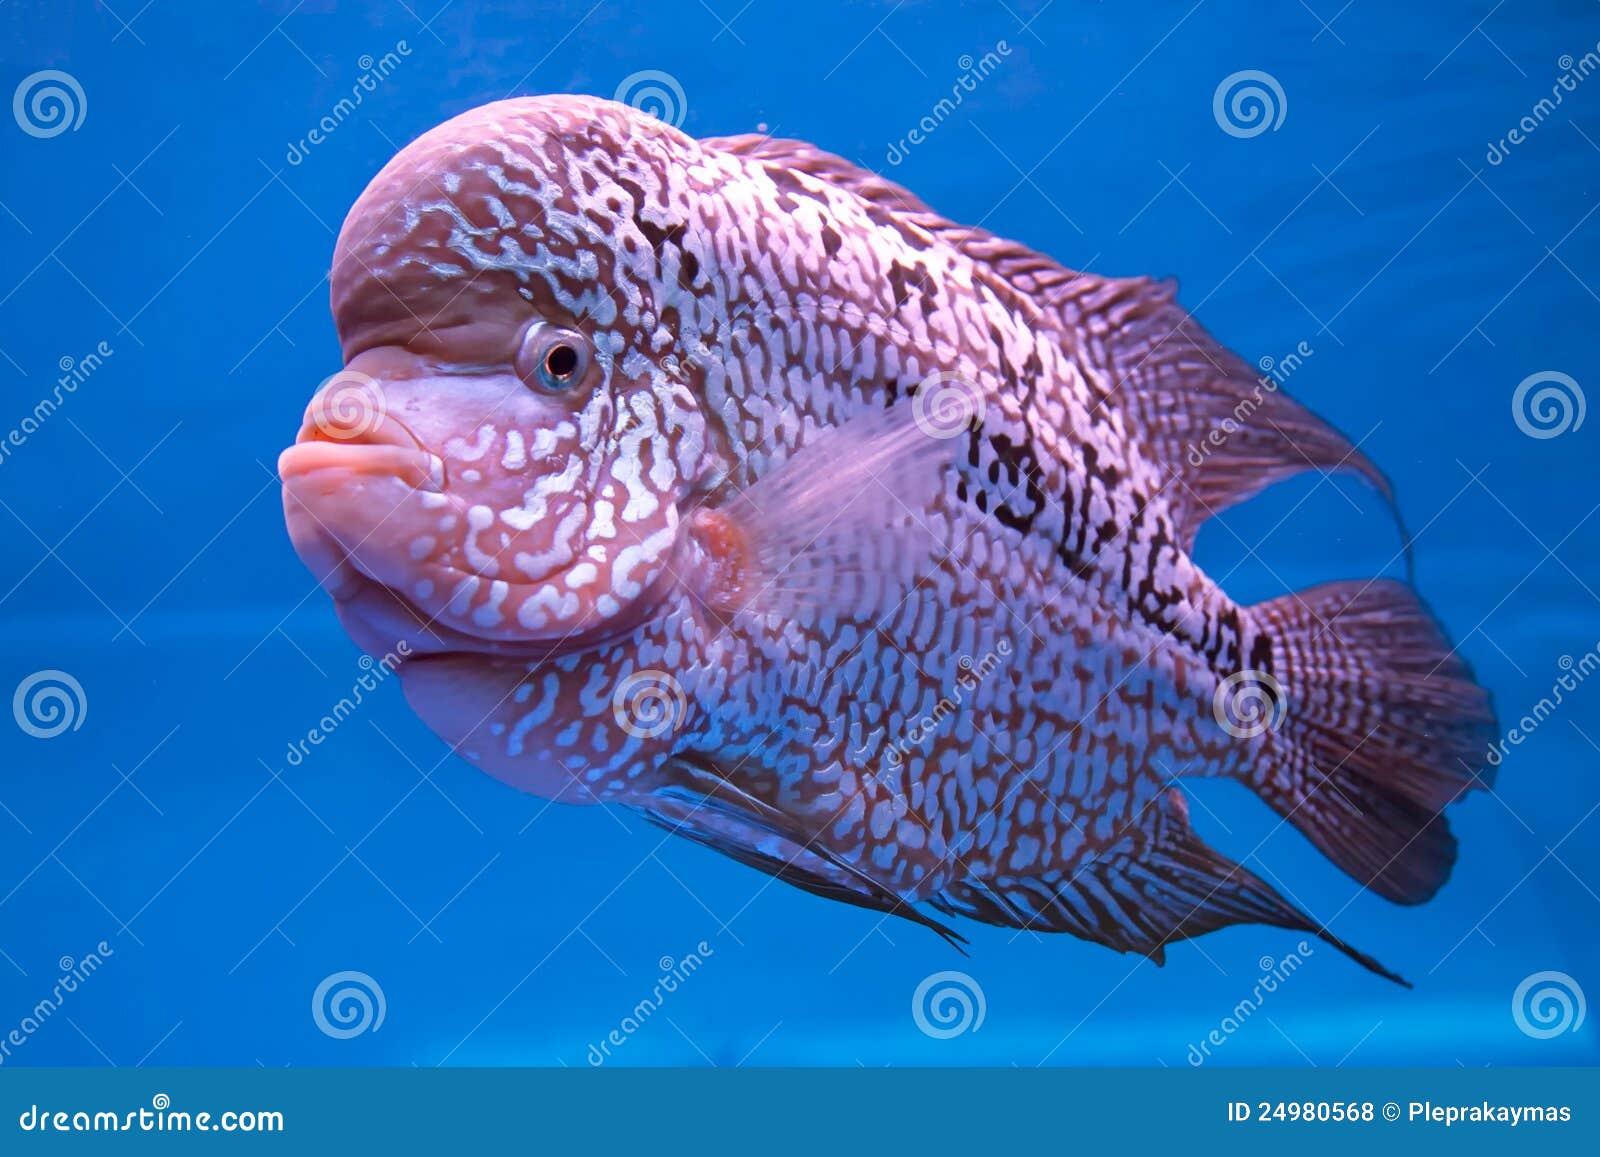 Aquarium Fish Flower Horn Fish Royalty Free Stock s Image